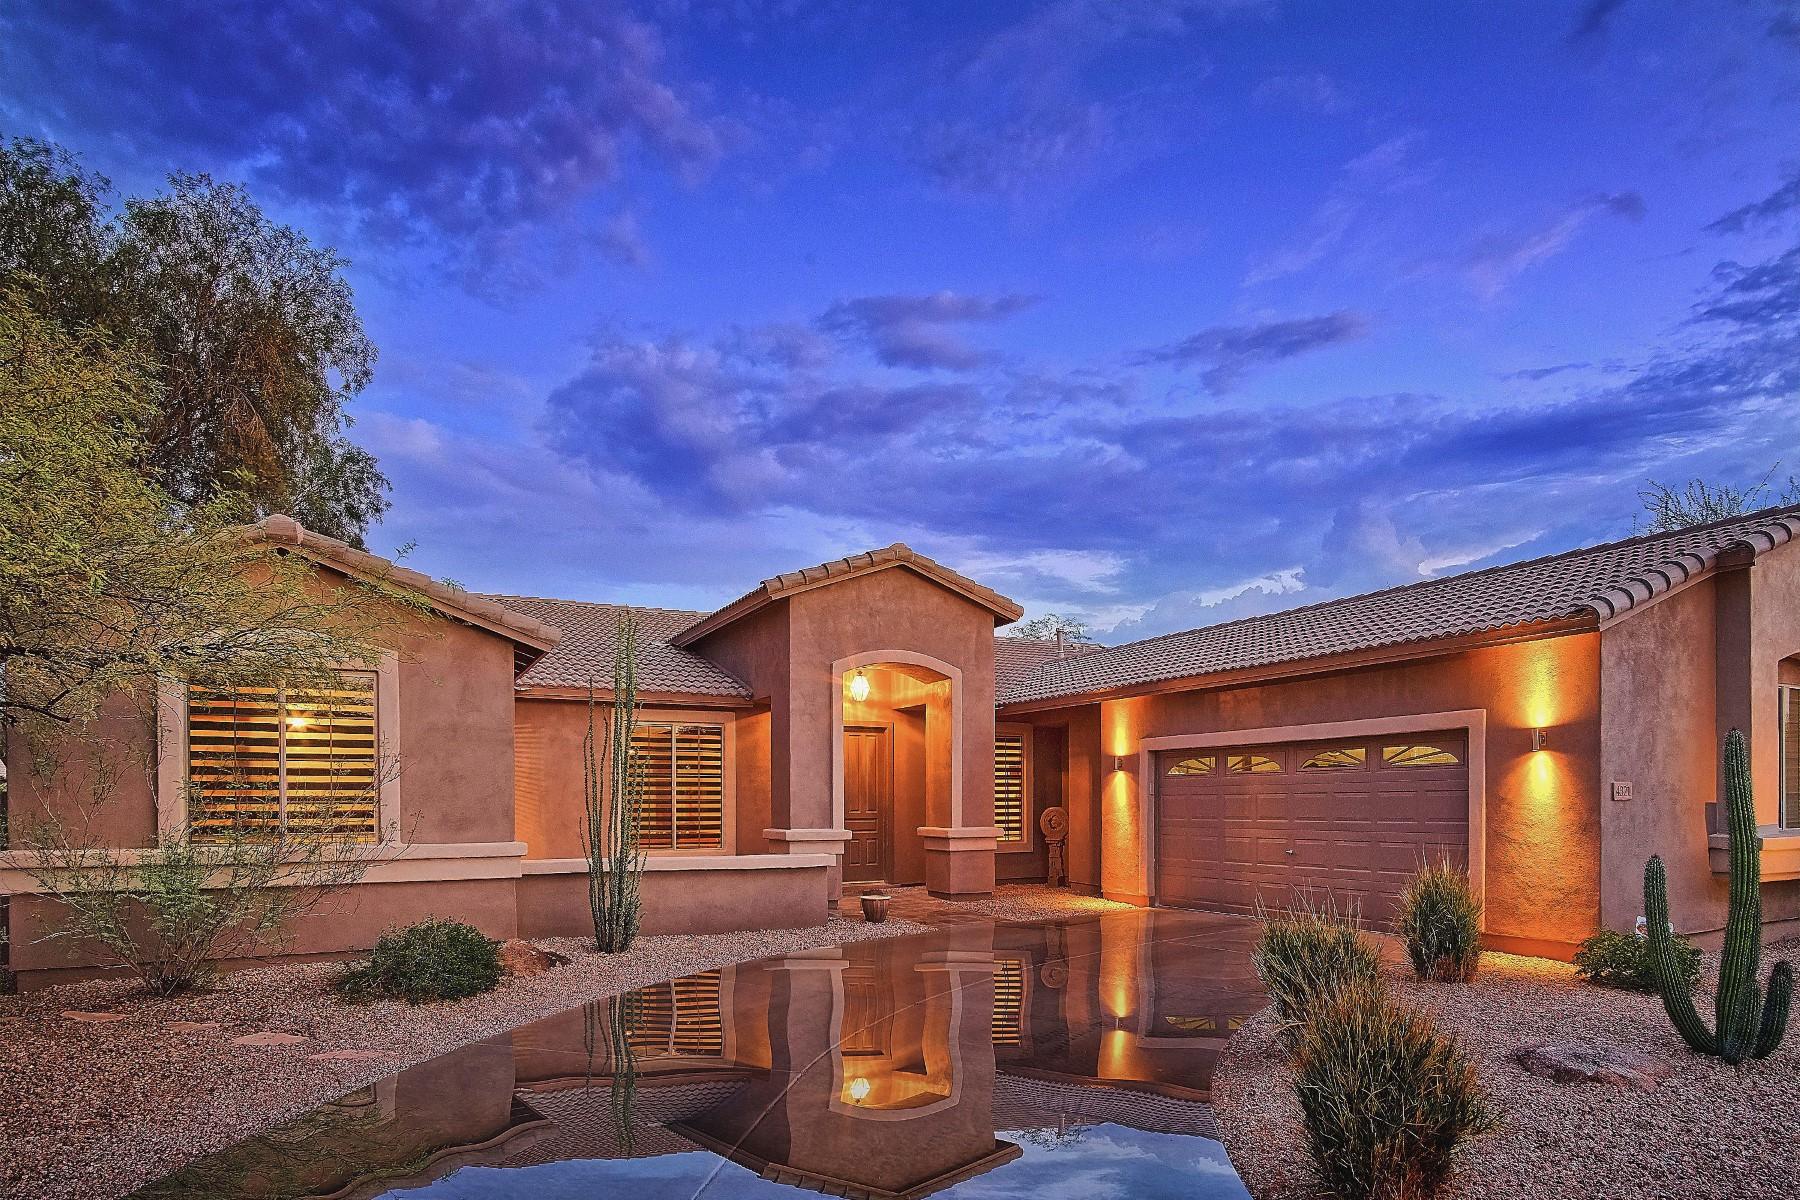 Moradia para Venda às Charming Dove Valley Ranch home 4321 E Happy Coyote Trl Cave Creek, Arizona, 85331 Estados Unidos